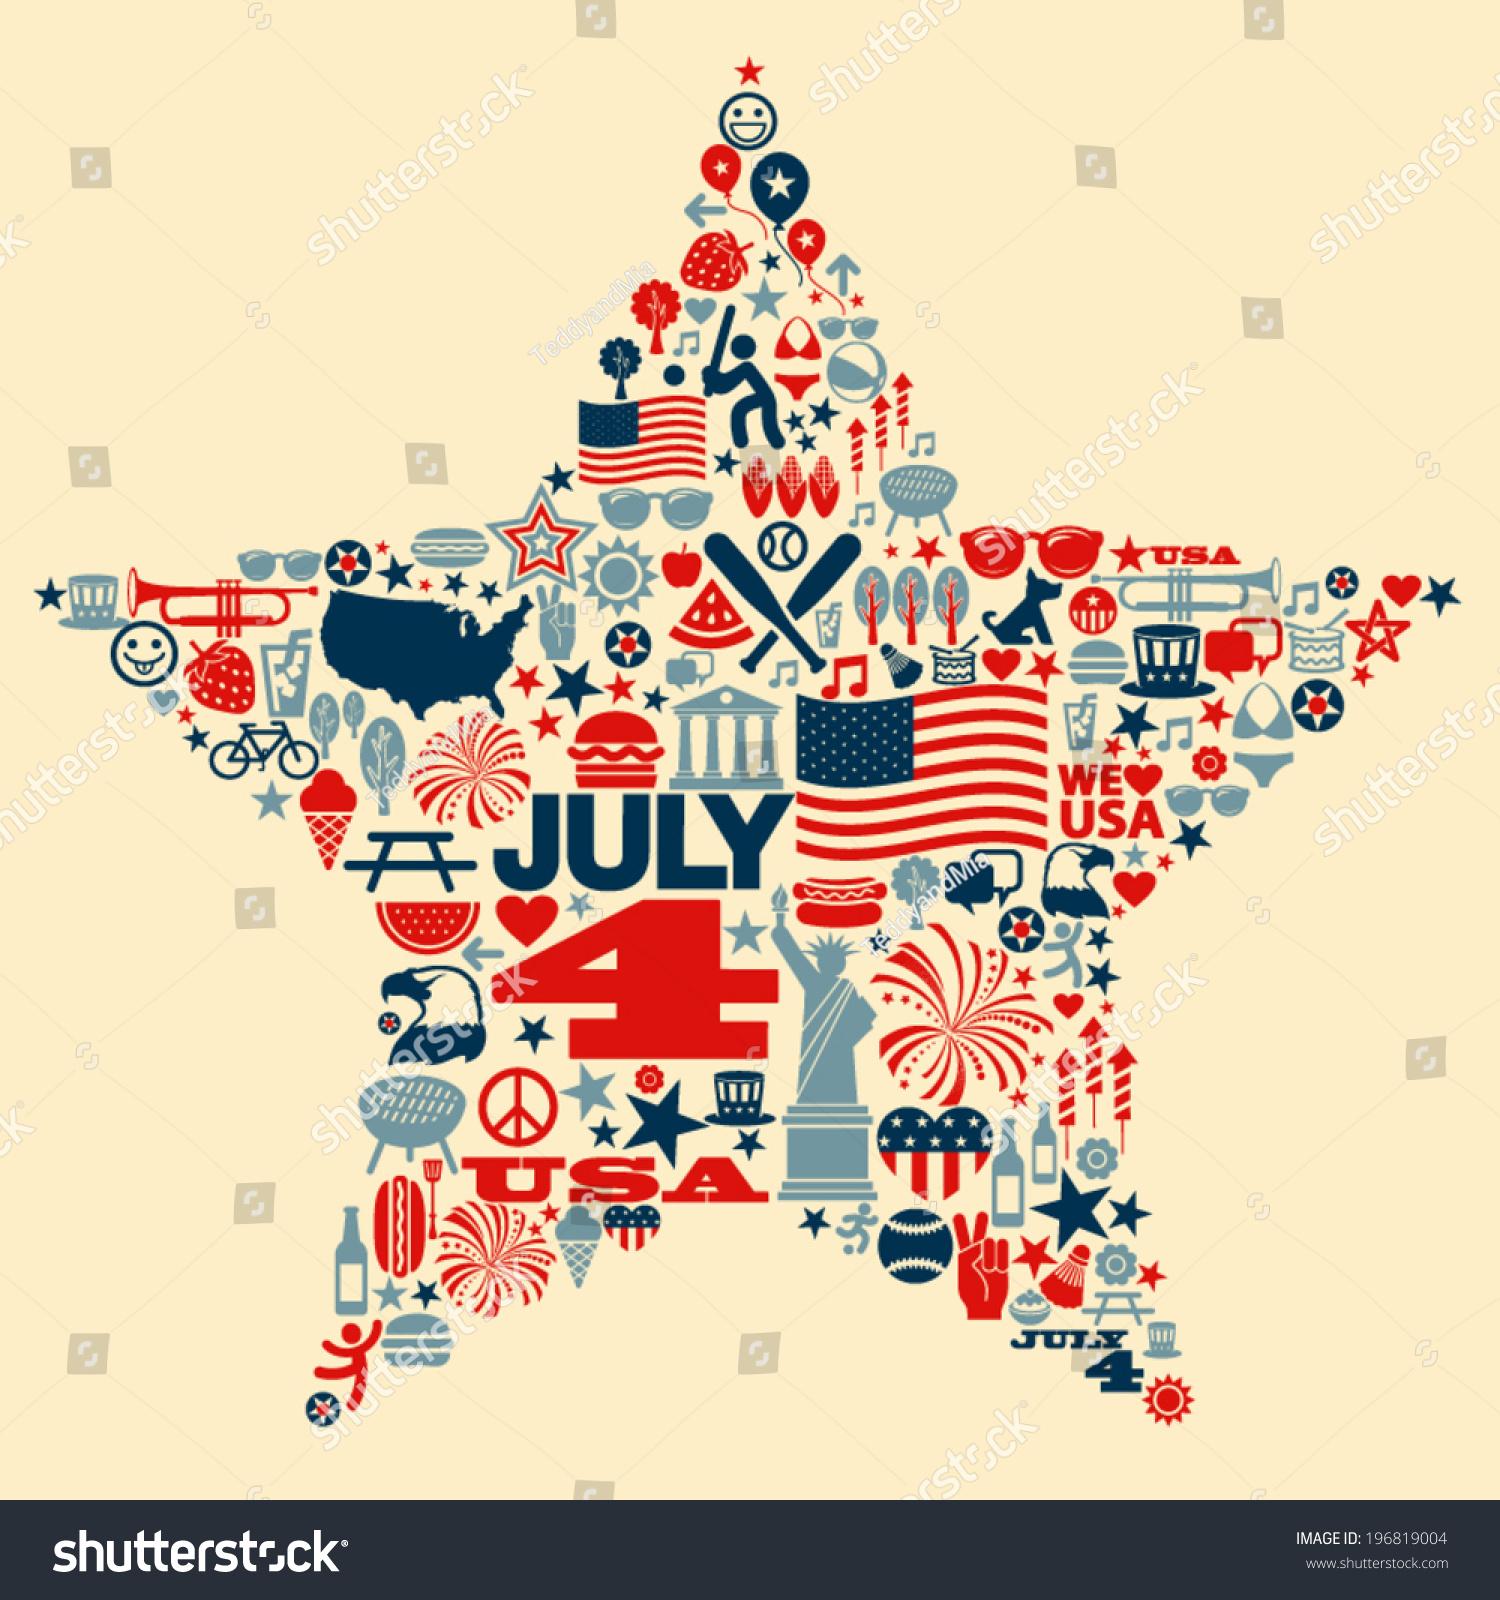 Shirt design usa - 4th Of July Icons Symbols Collage T Shirt Design